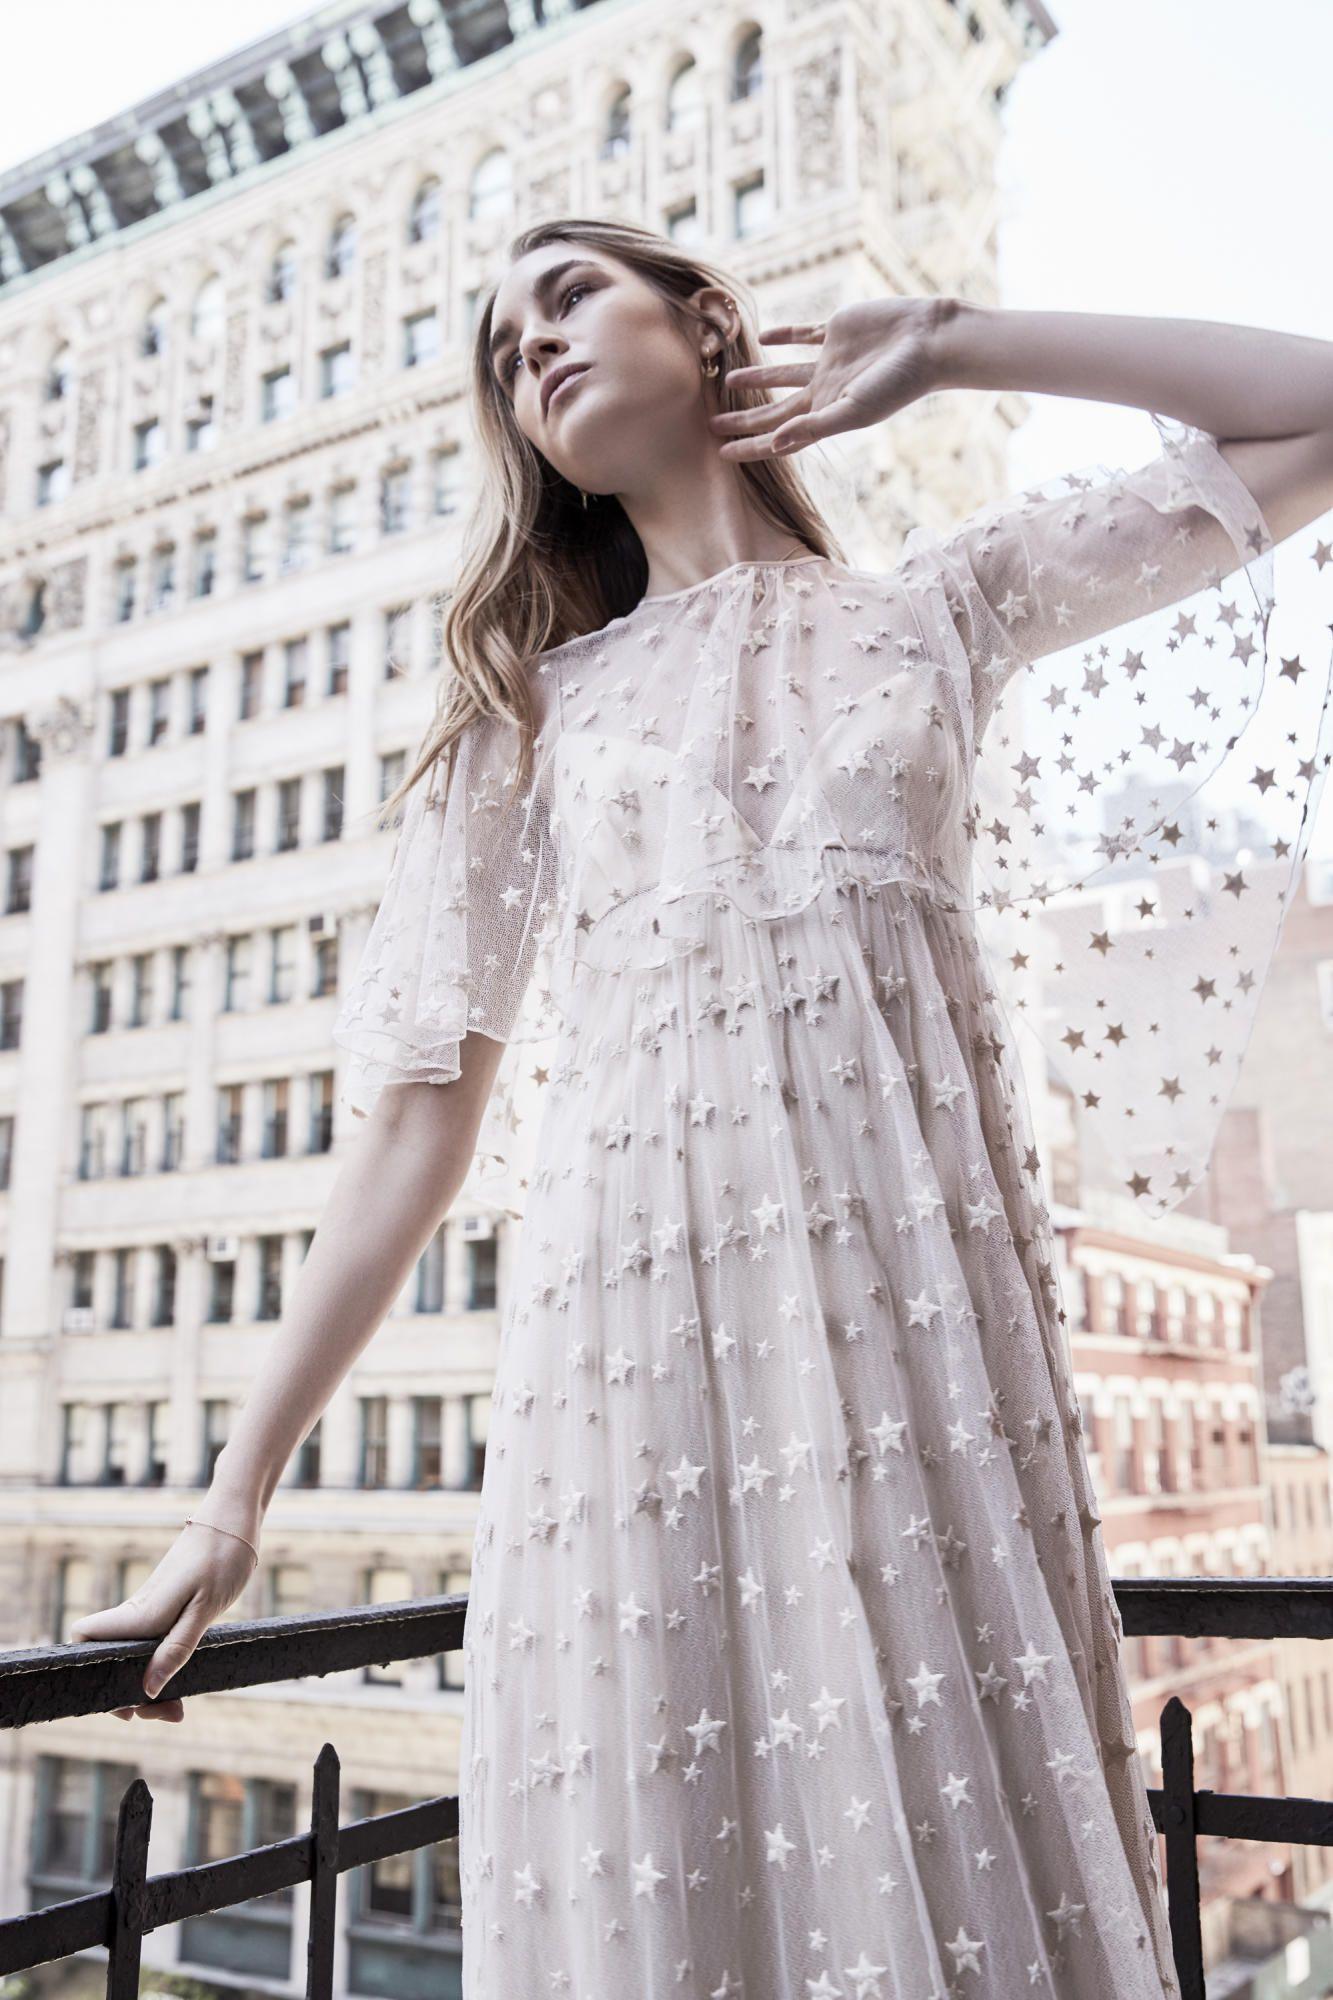 savannah-miller-spring-2018-bridal-stars-cape-dress Tendências de vestidos de noiva para 2018